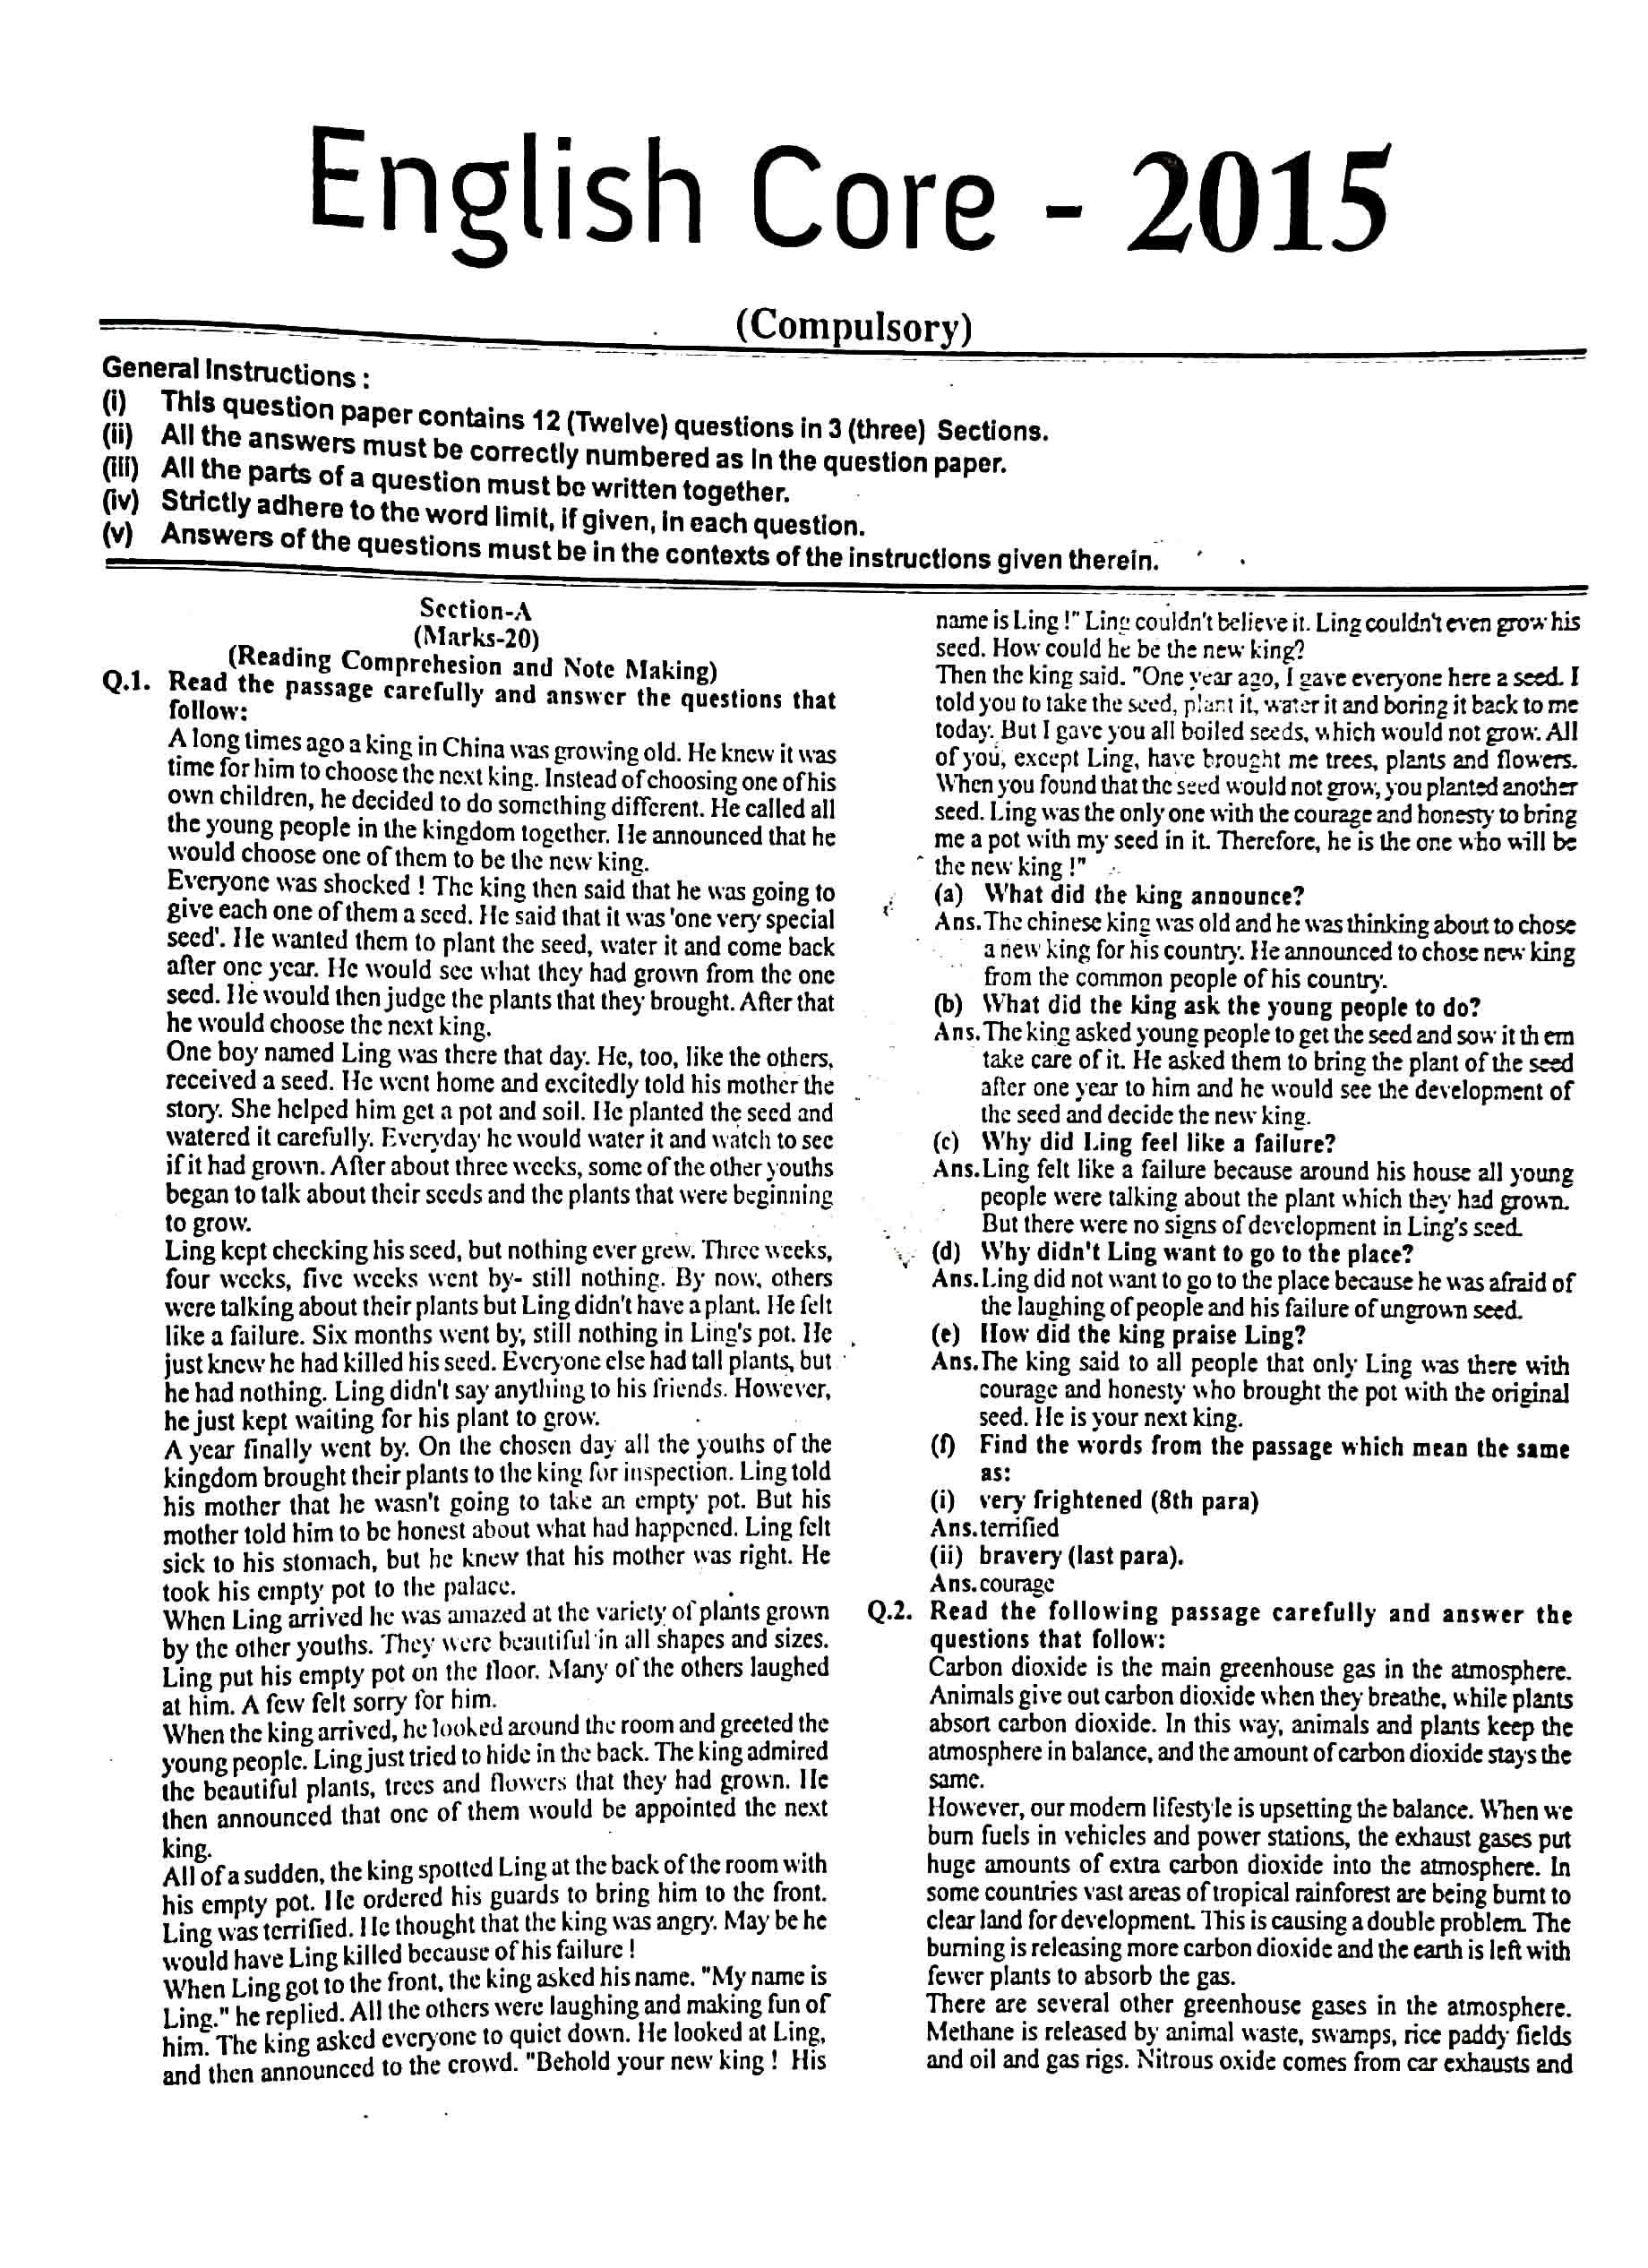 JAC Class 12 english-core 2015 Question Paper 01